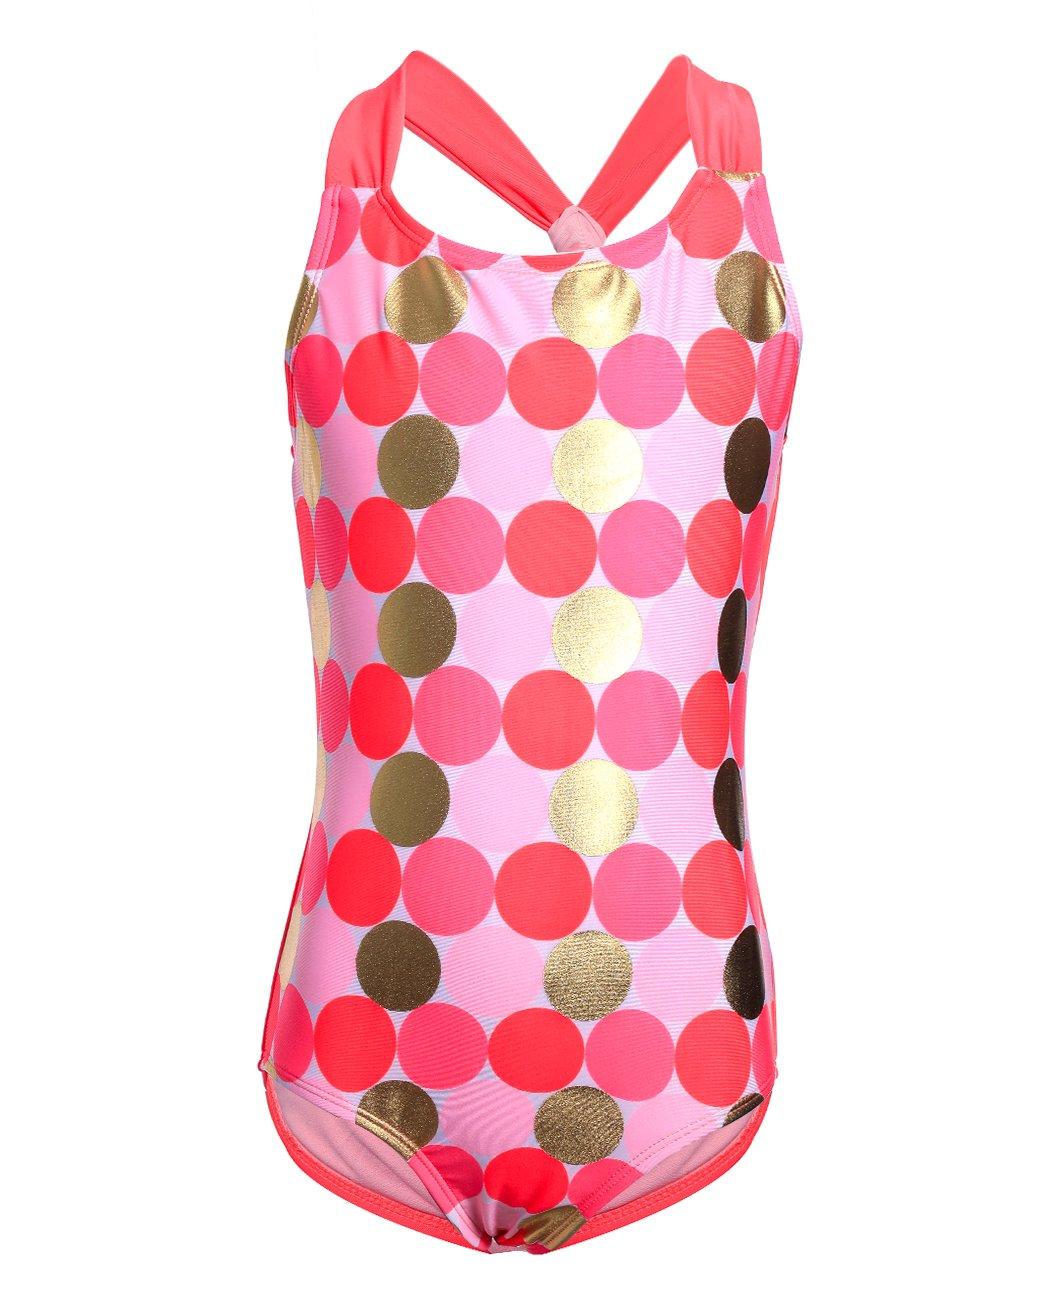 iDrawl Girls Swimwear One Piece Bathing Suit Kids Swimsuit